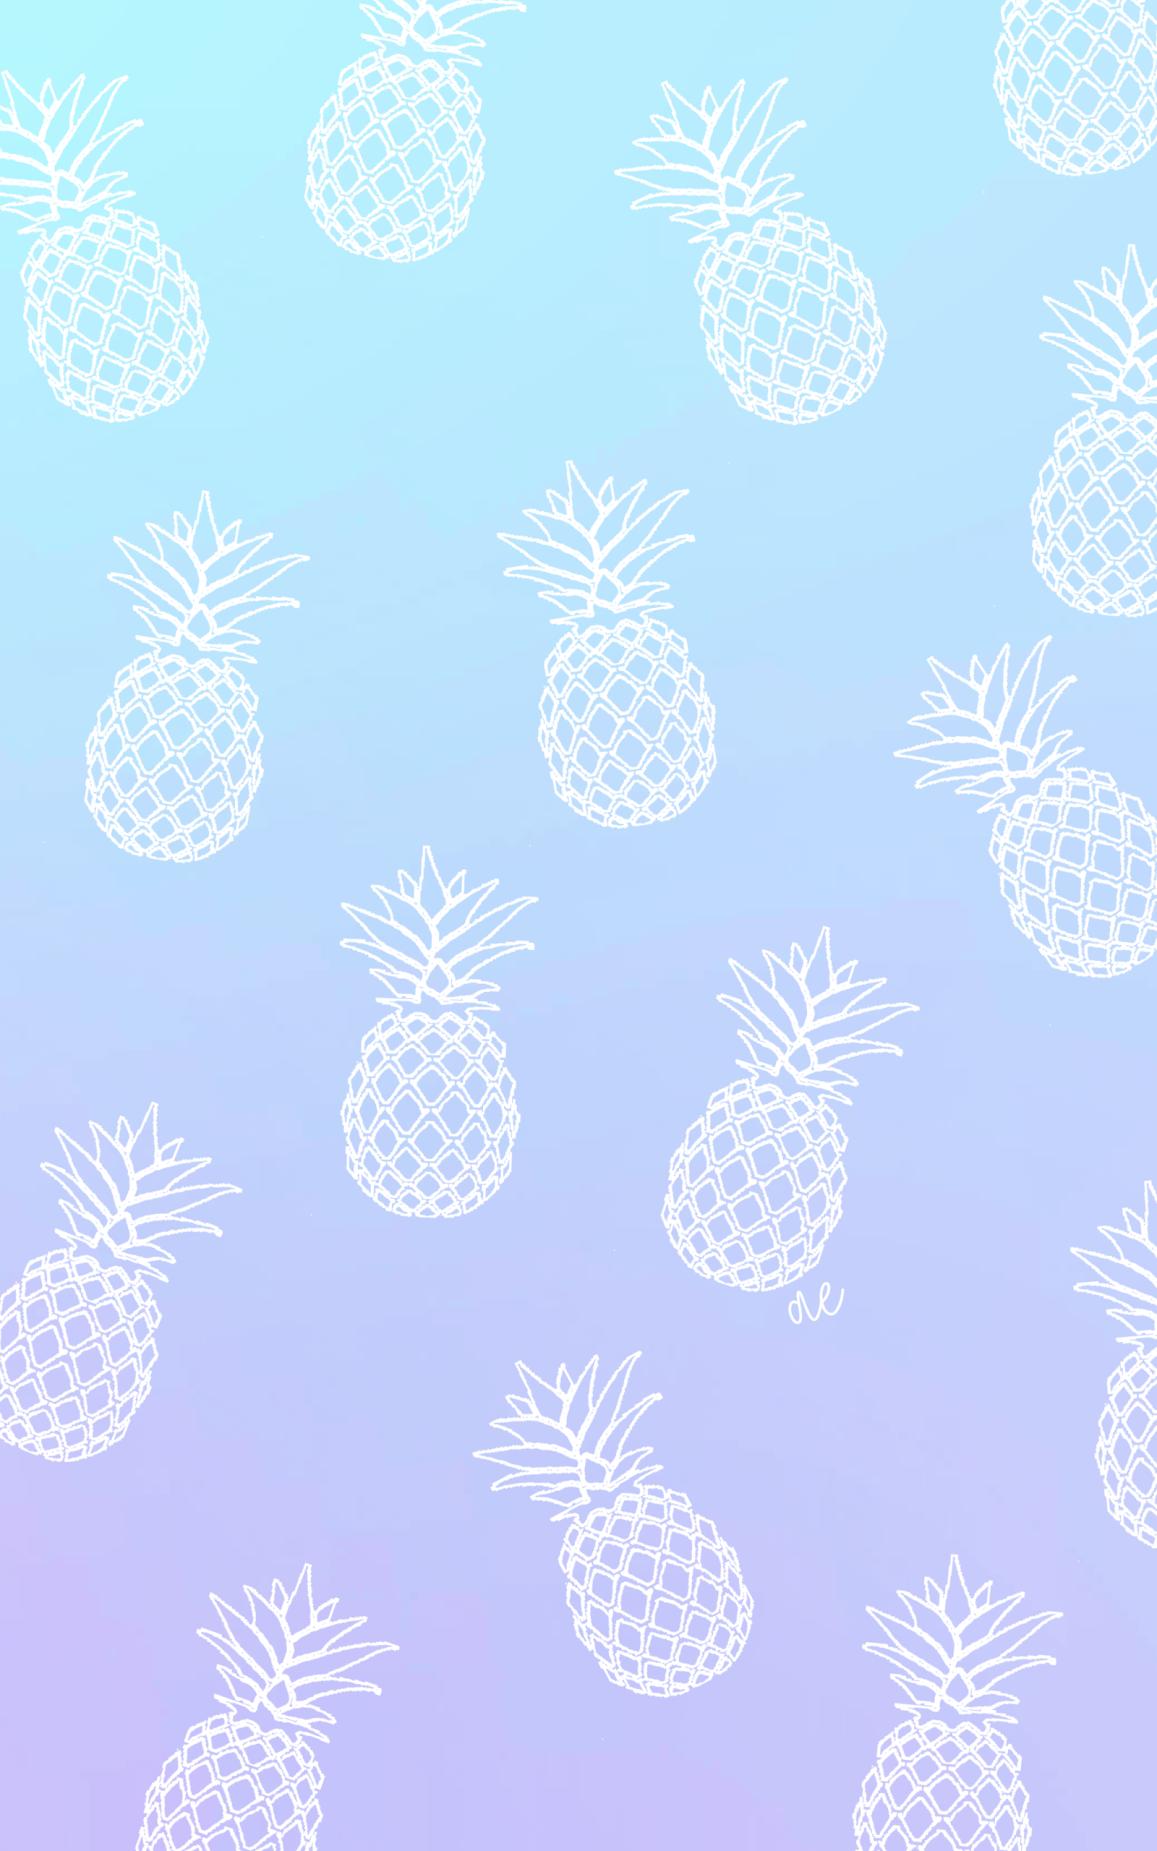 Pineapple Wallpaper Background Pineapple Wallpaper Color Wallpaper Iphone Cute Pineapple Wallpaper